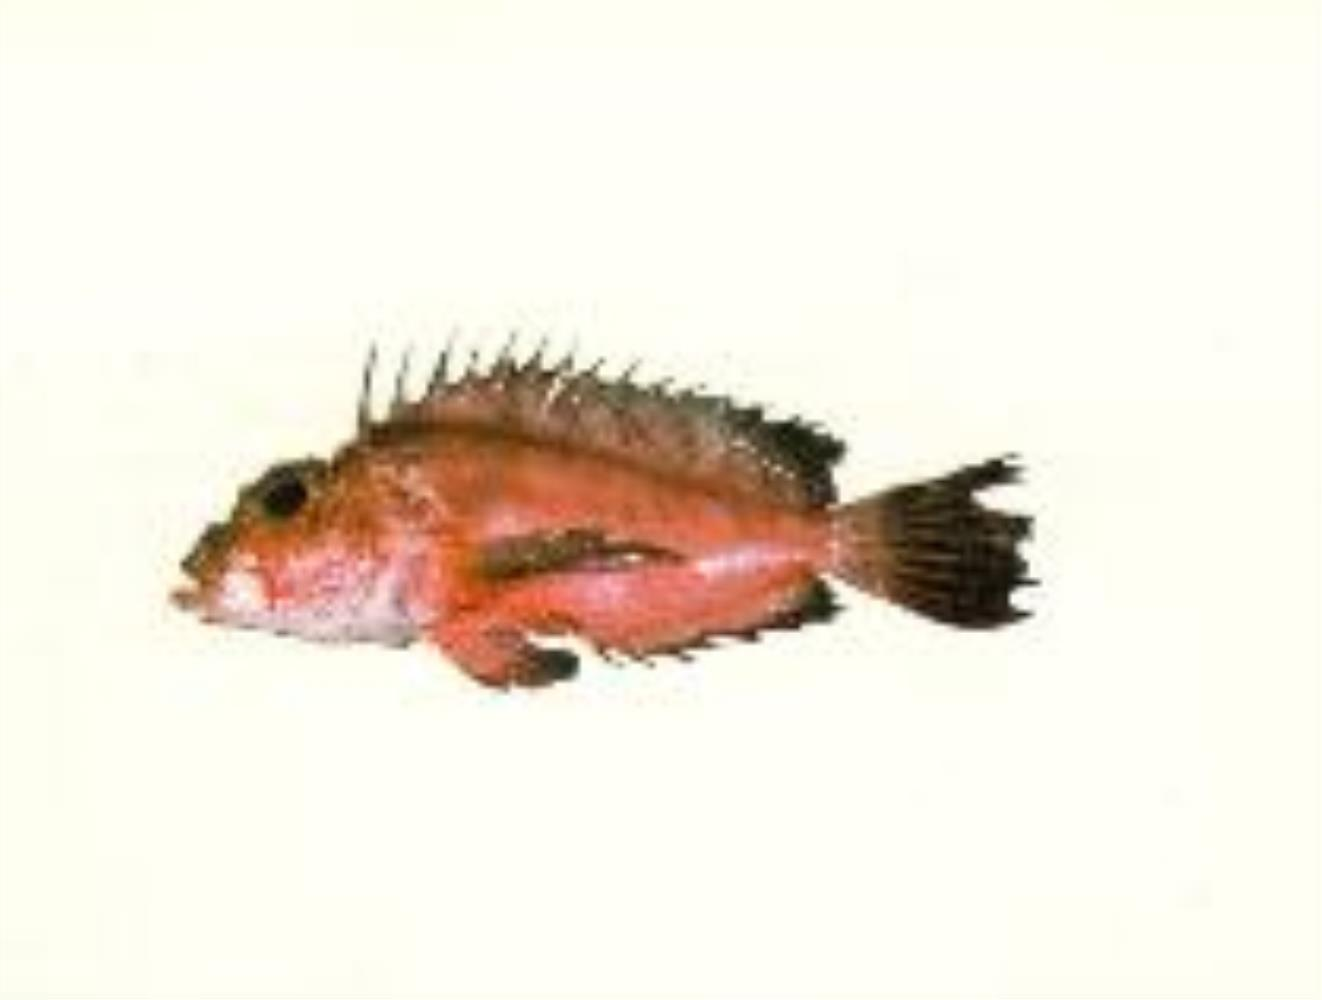 Onestick Stingfish